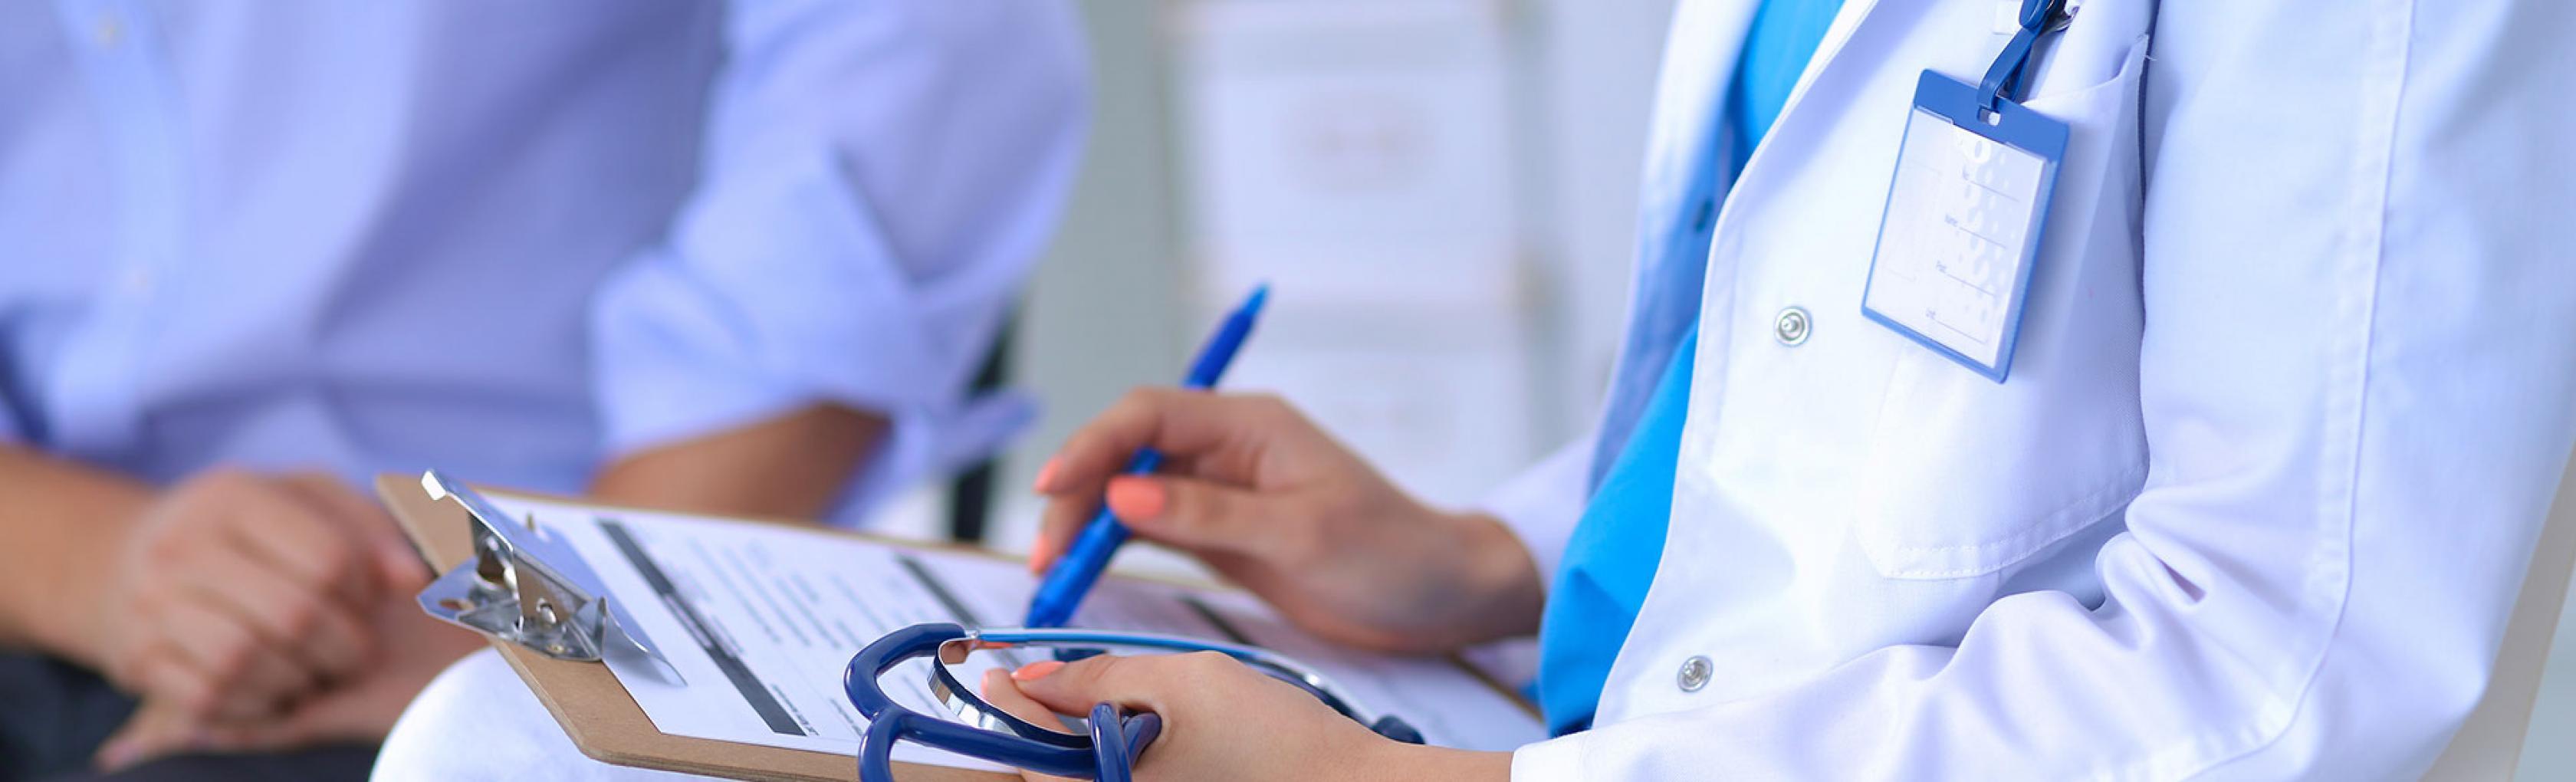 Assistenza sanitaria